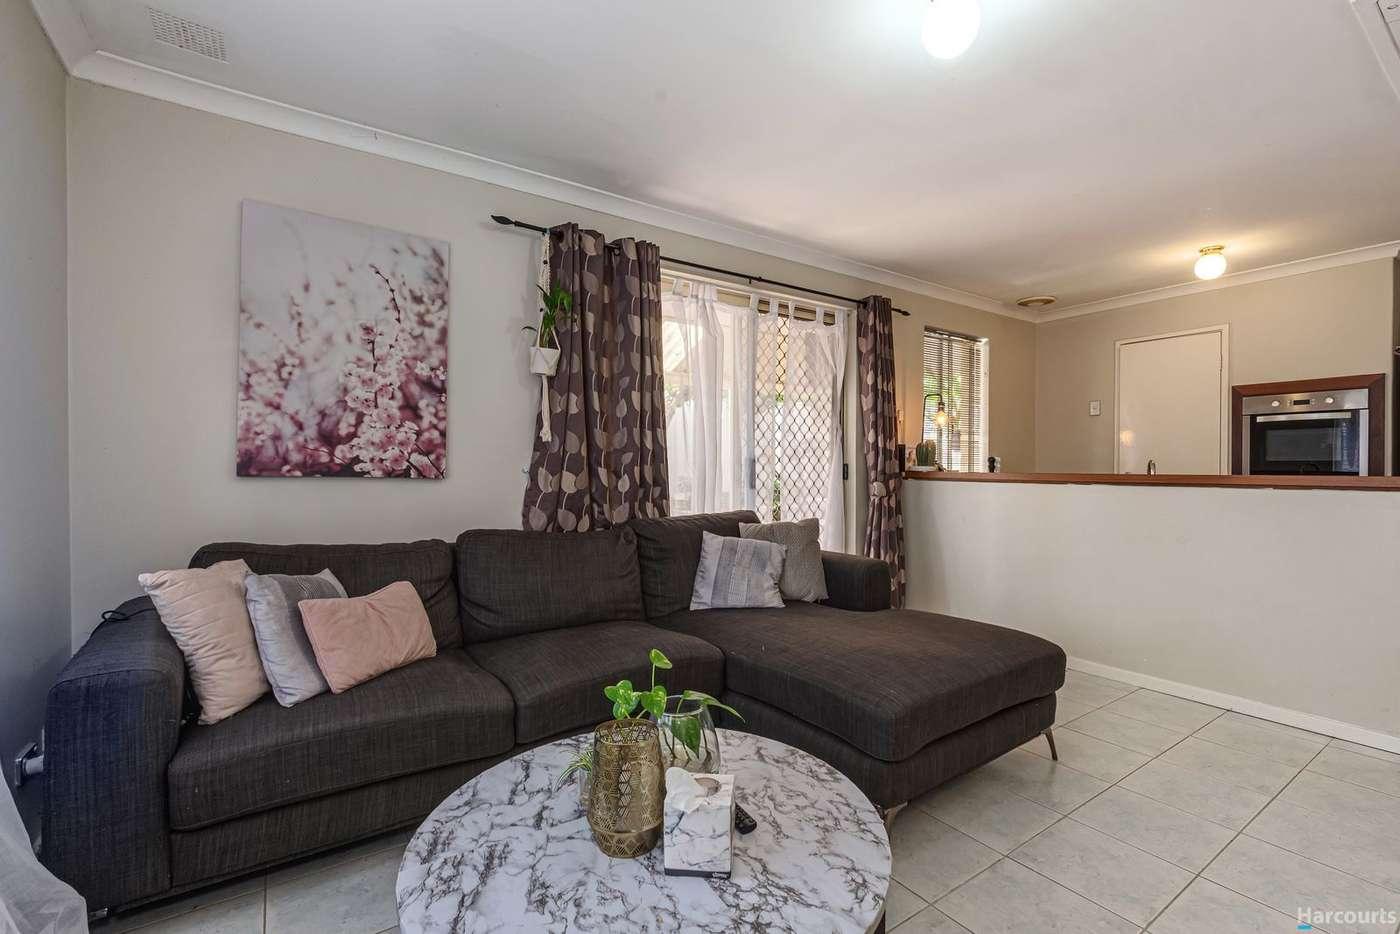 Sixth view of Homely house listing, 2 Thornton Retreat, Kinross WA 6028